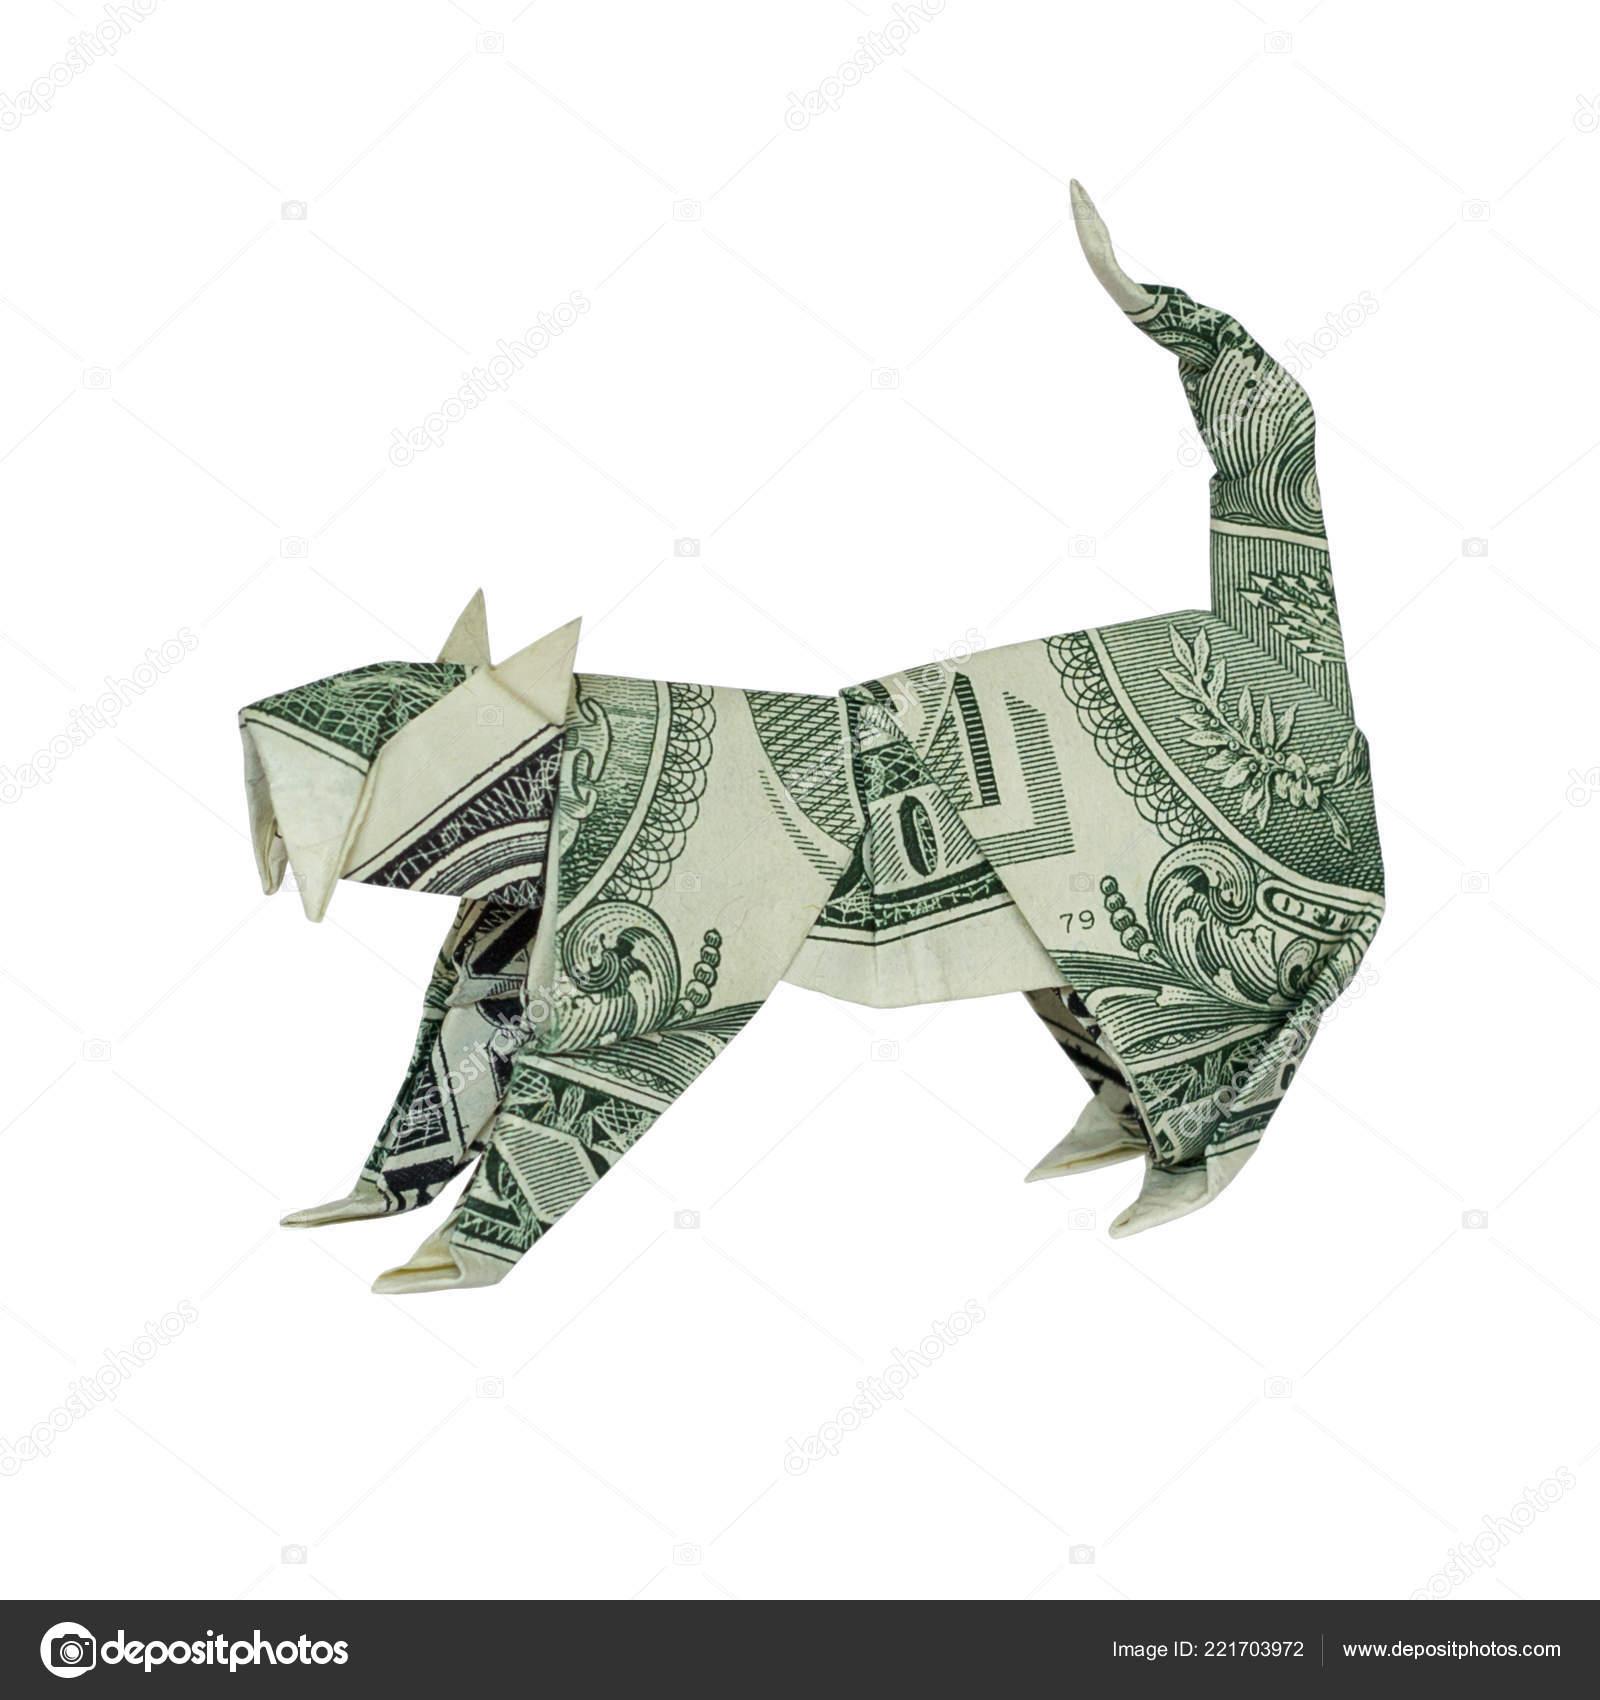 Dollar Bill Origami Money Origami Wild Cat Folded Real One Dollar Bill Isolated Stock